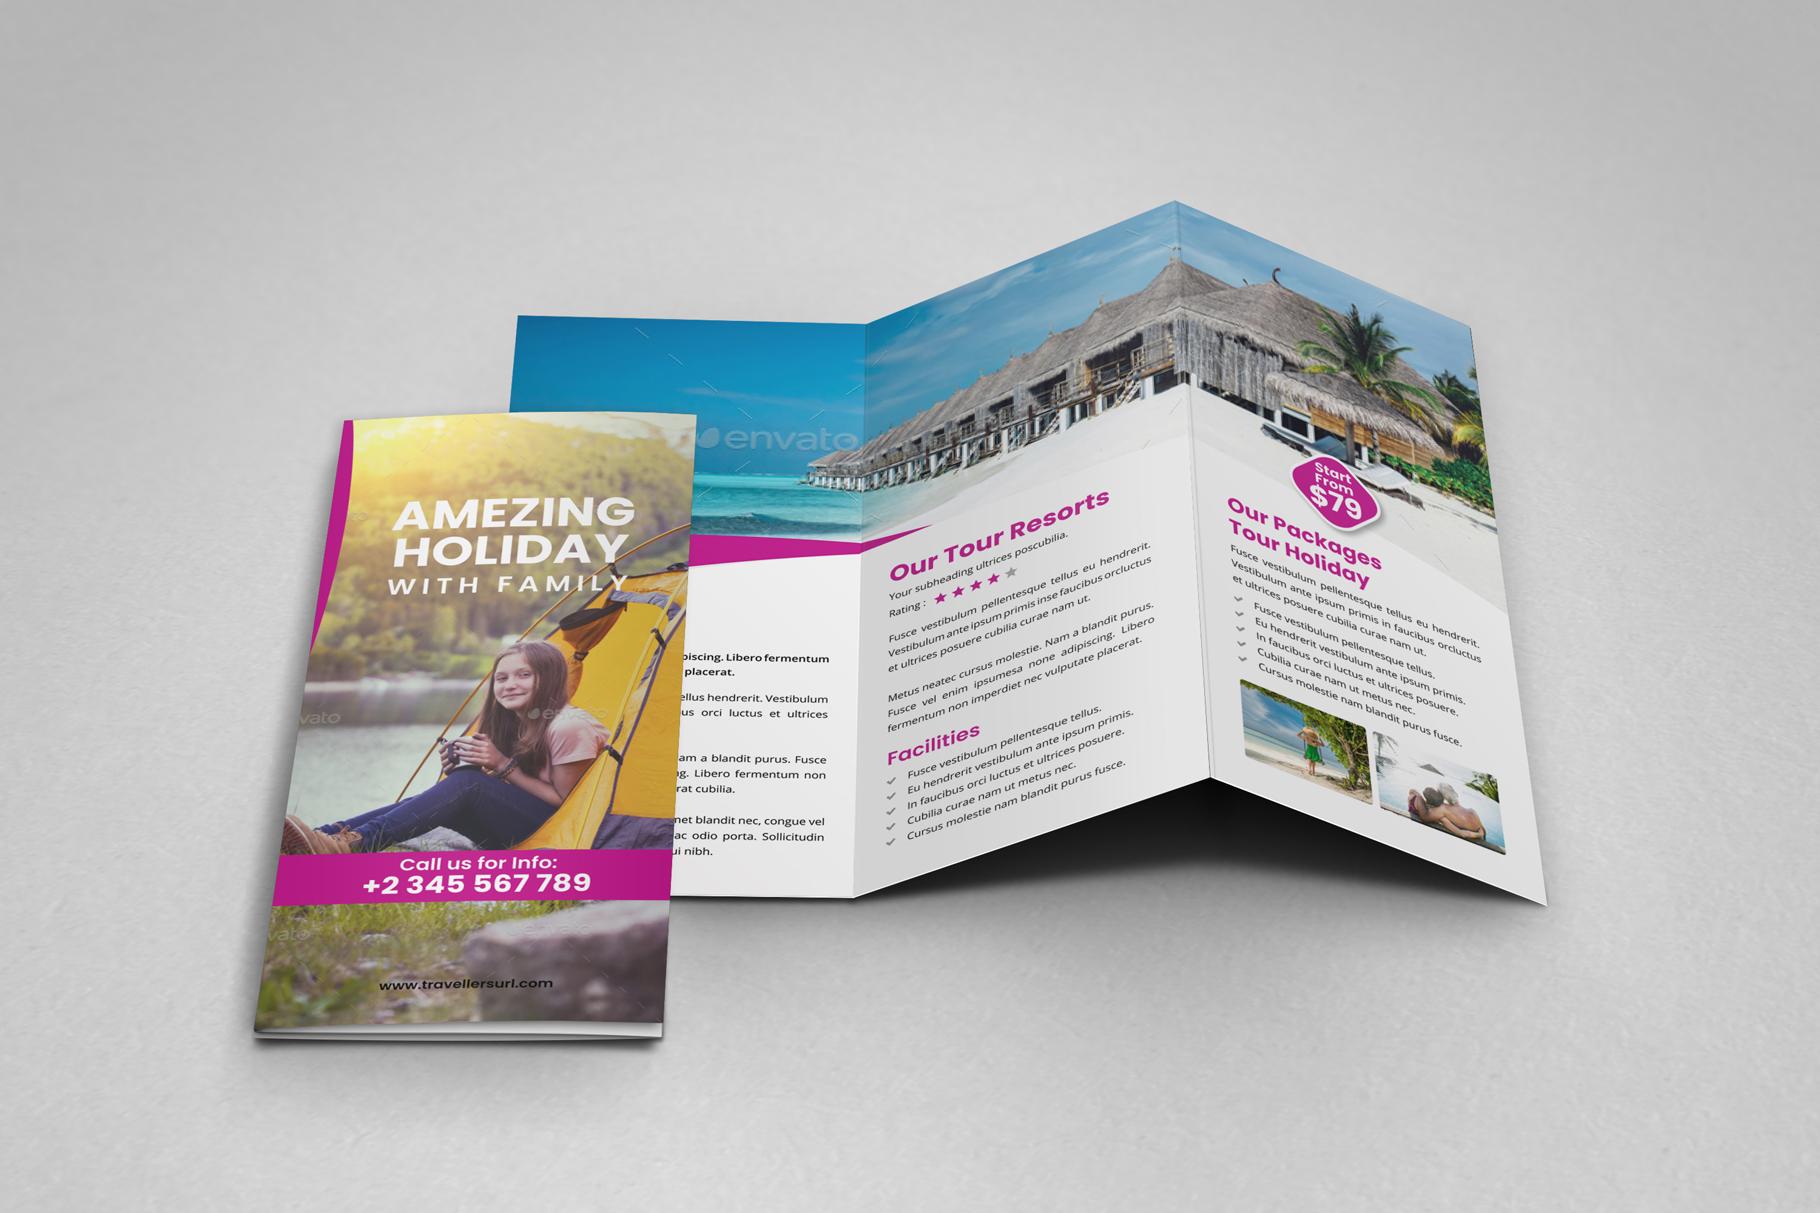 Travel Resort Trifold Brochure v3 example image 7